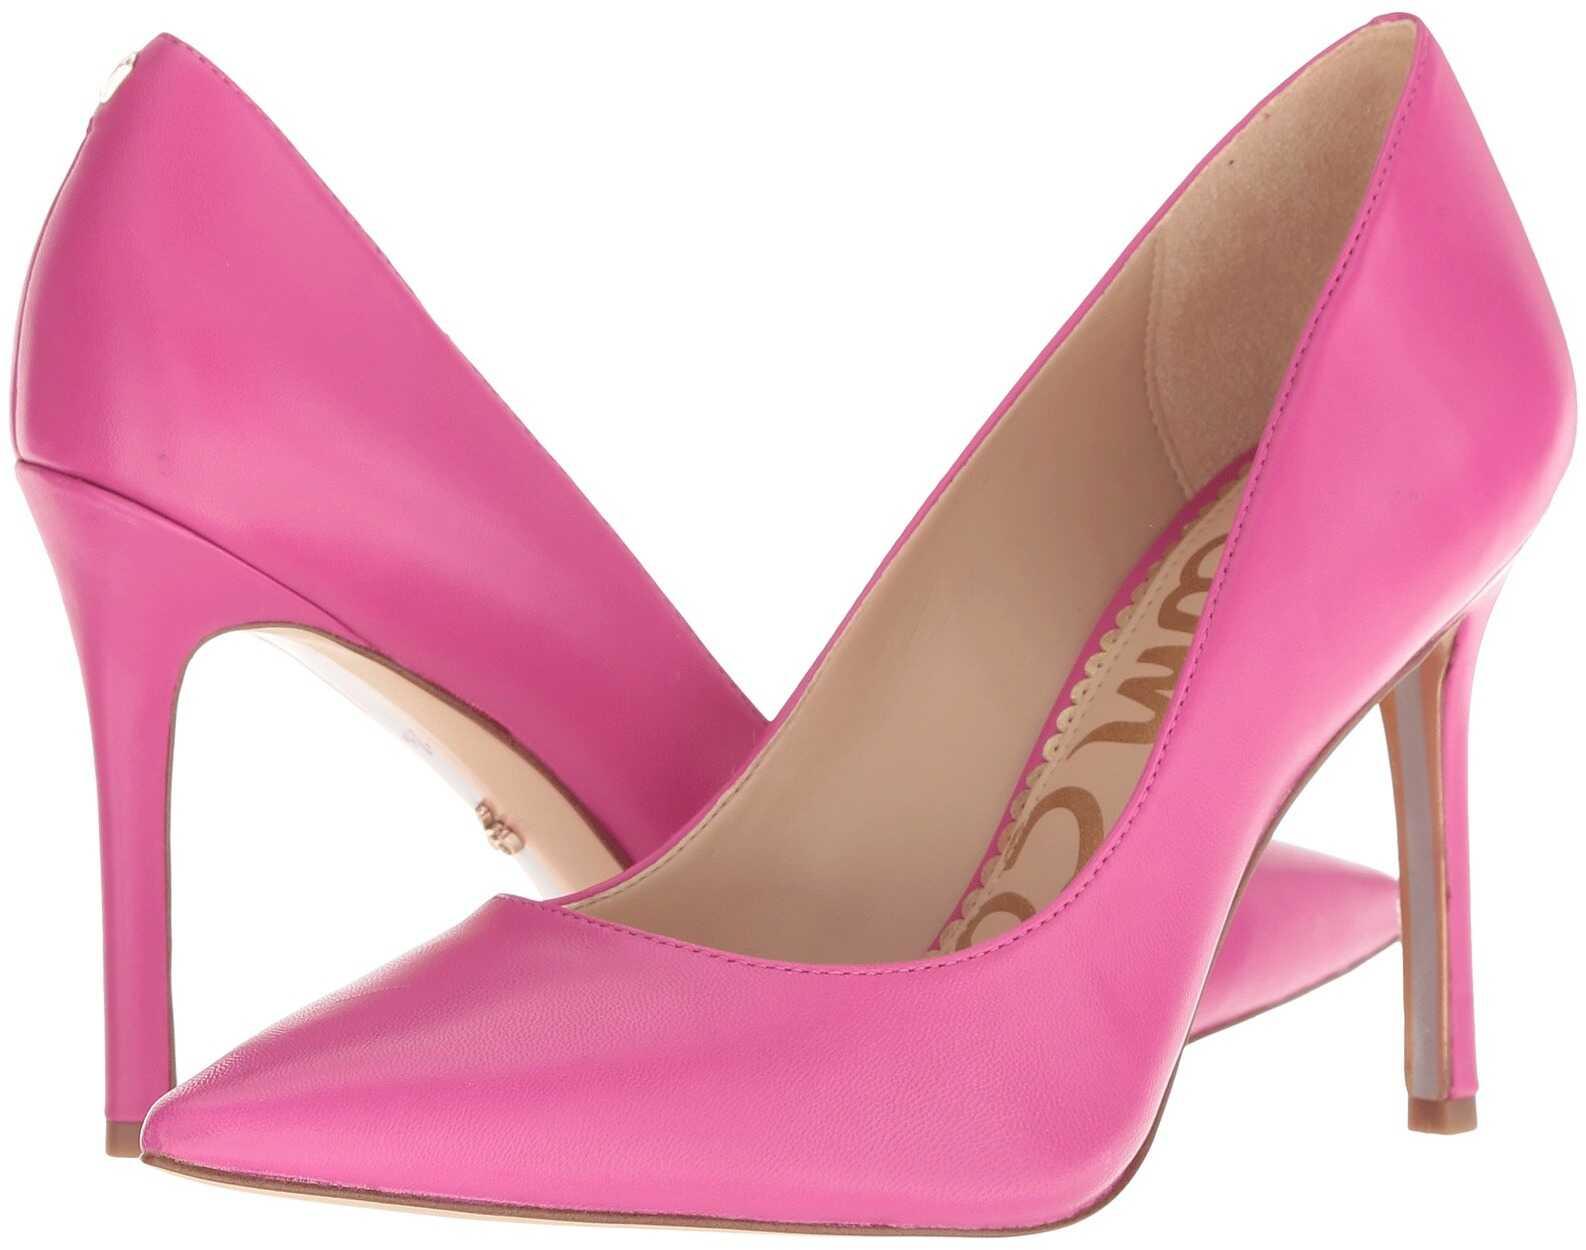 Sam Edelman Hazel Retro Pink Leather Dress Nappa Leather